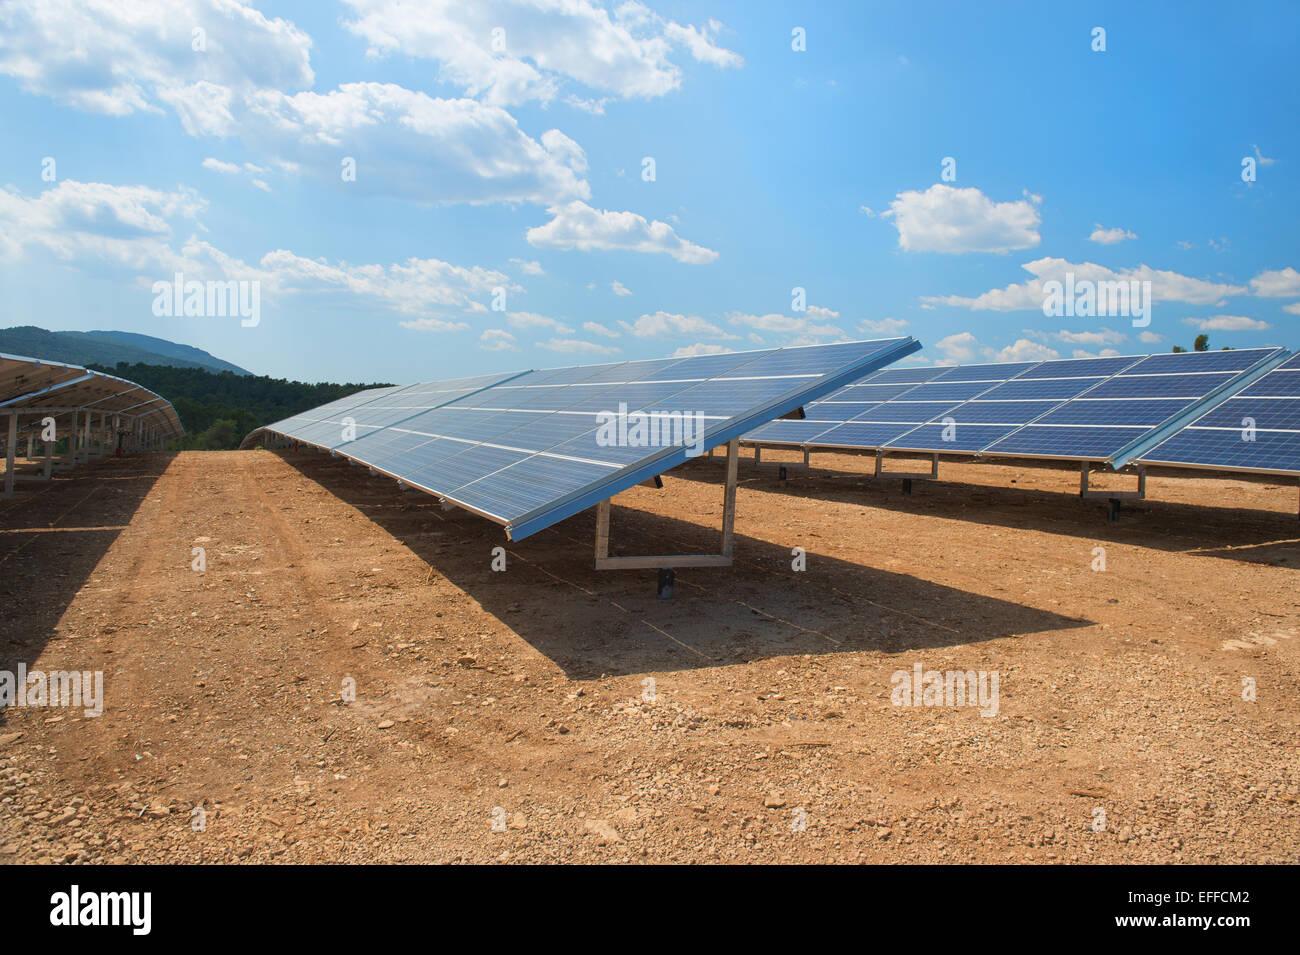 Solar panels in landscape - Stock Image